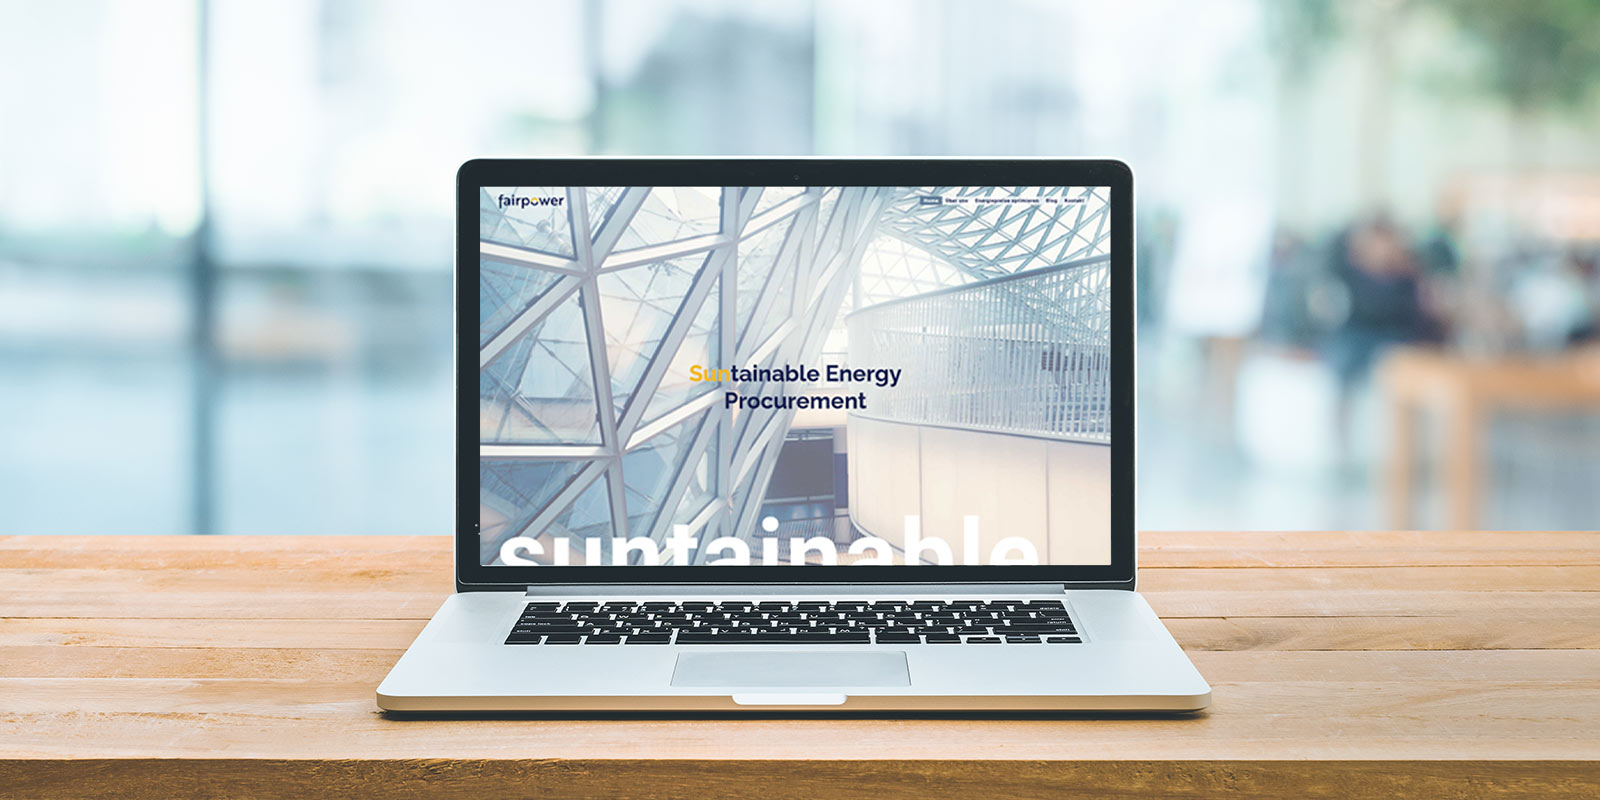 content-referenzen-details-fairpower-laptop-view-desktop